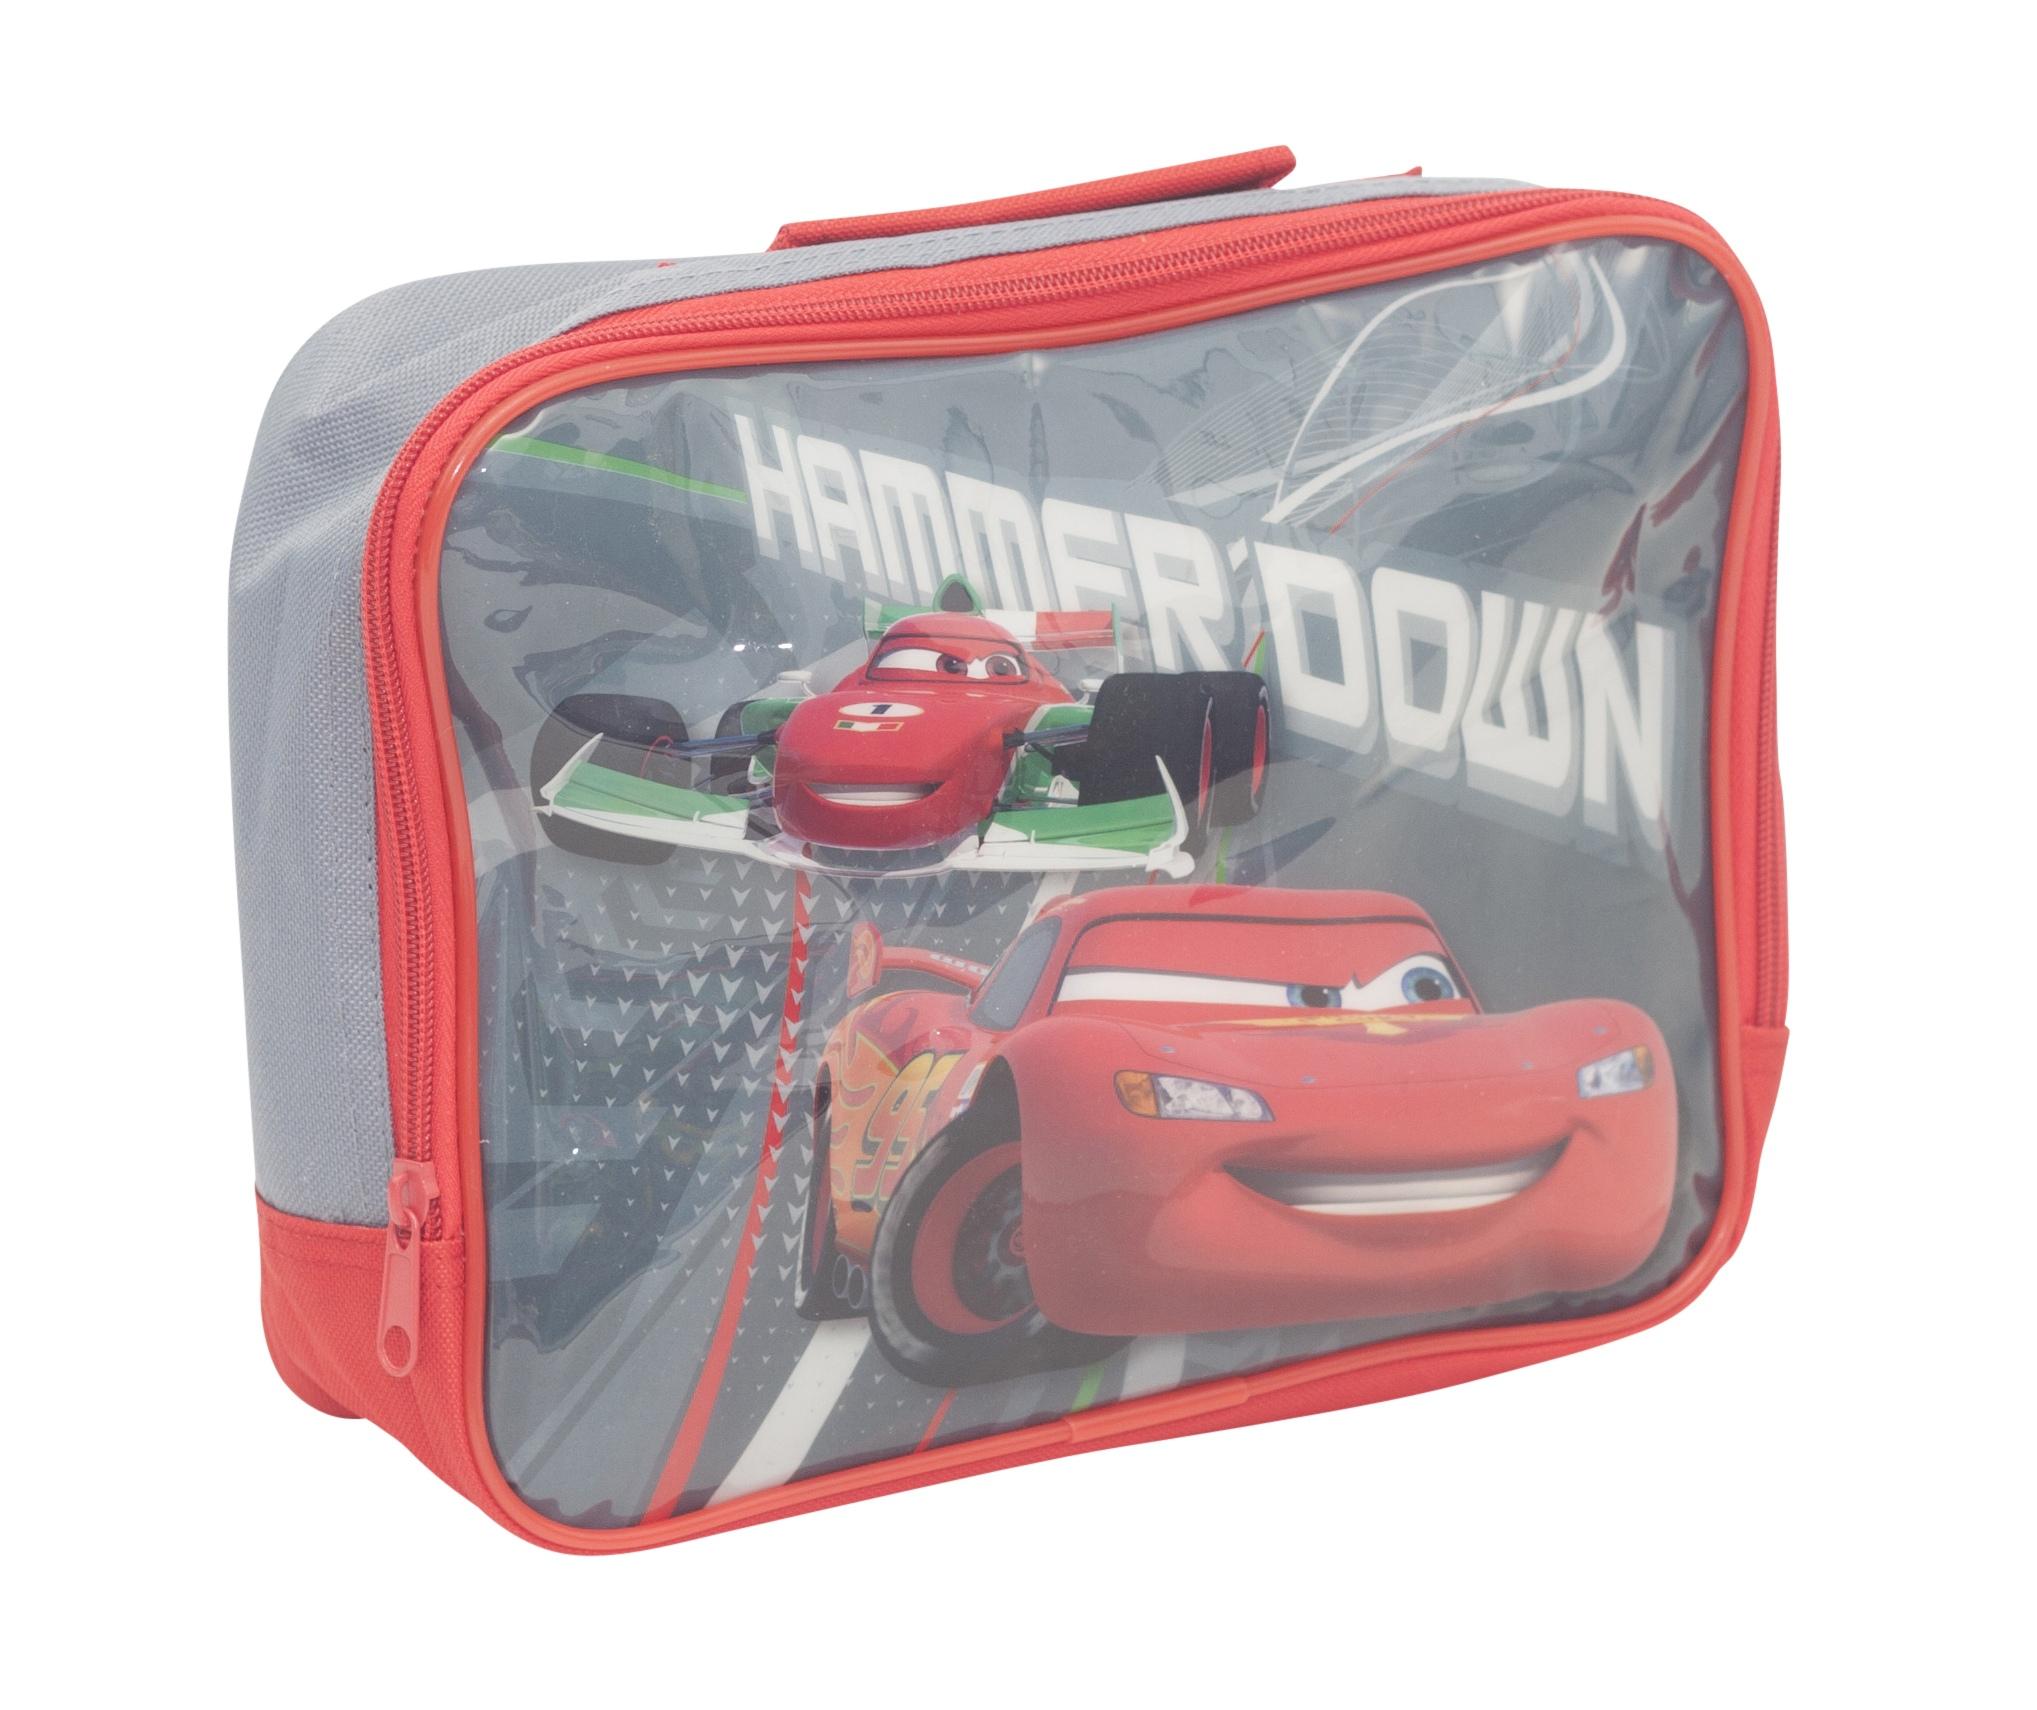 official disney insulated school lunch bag novelty box. Black Bedroom Furniture Sets. Home Design Ideas